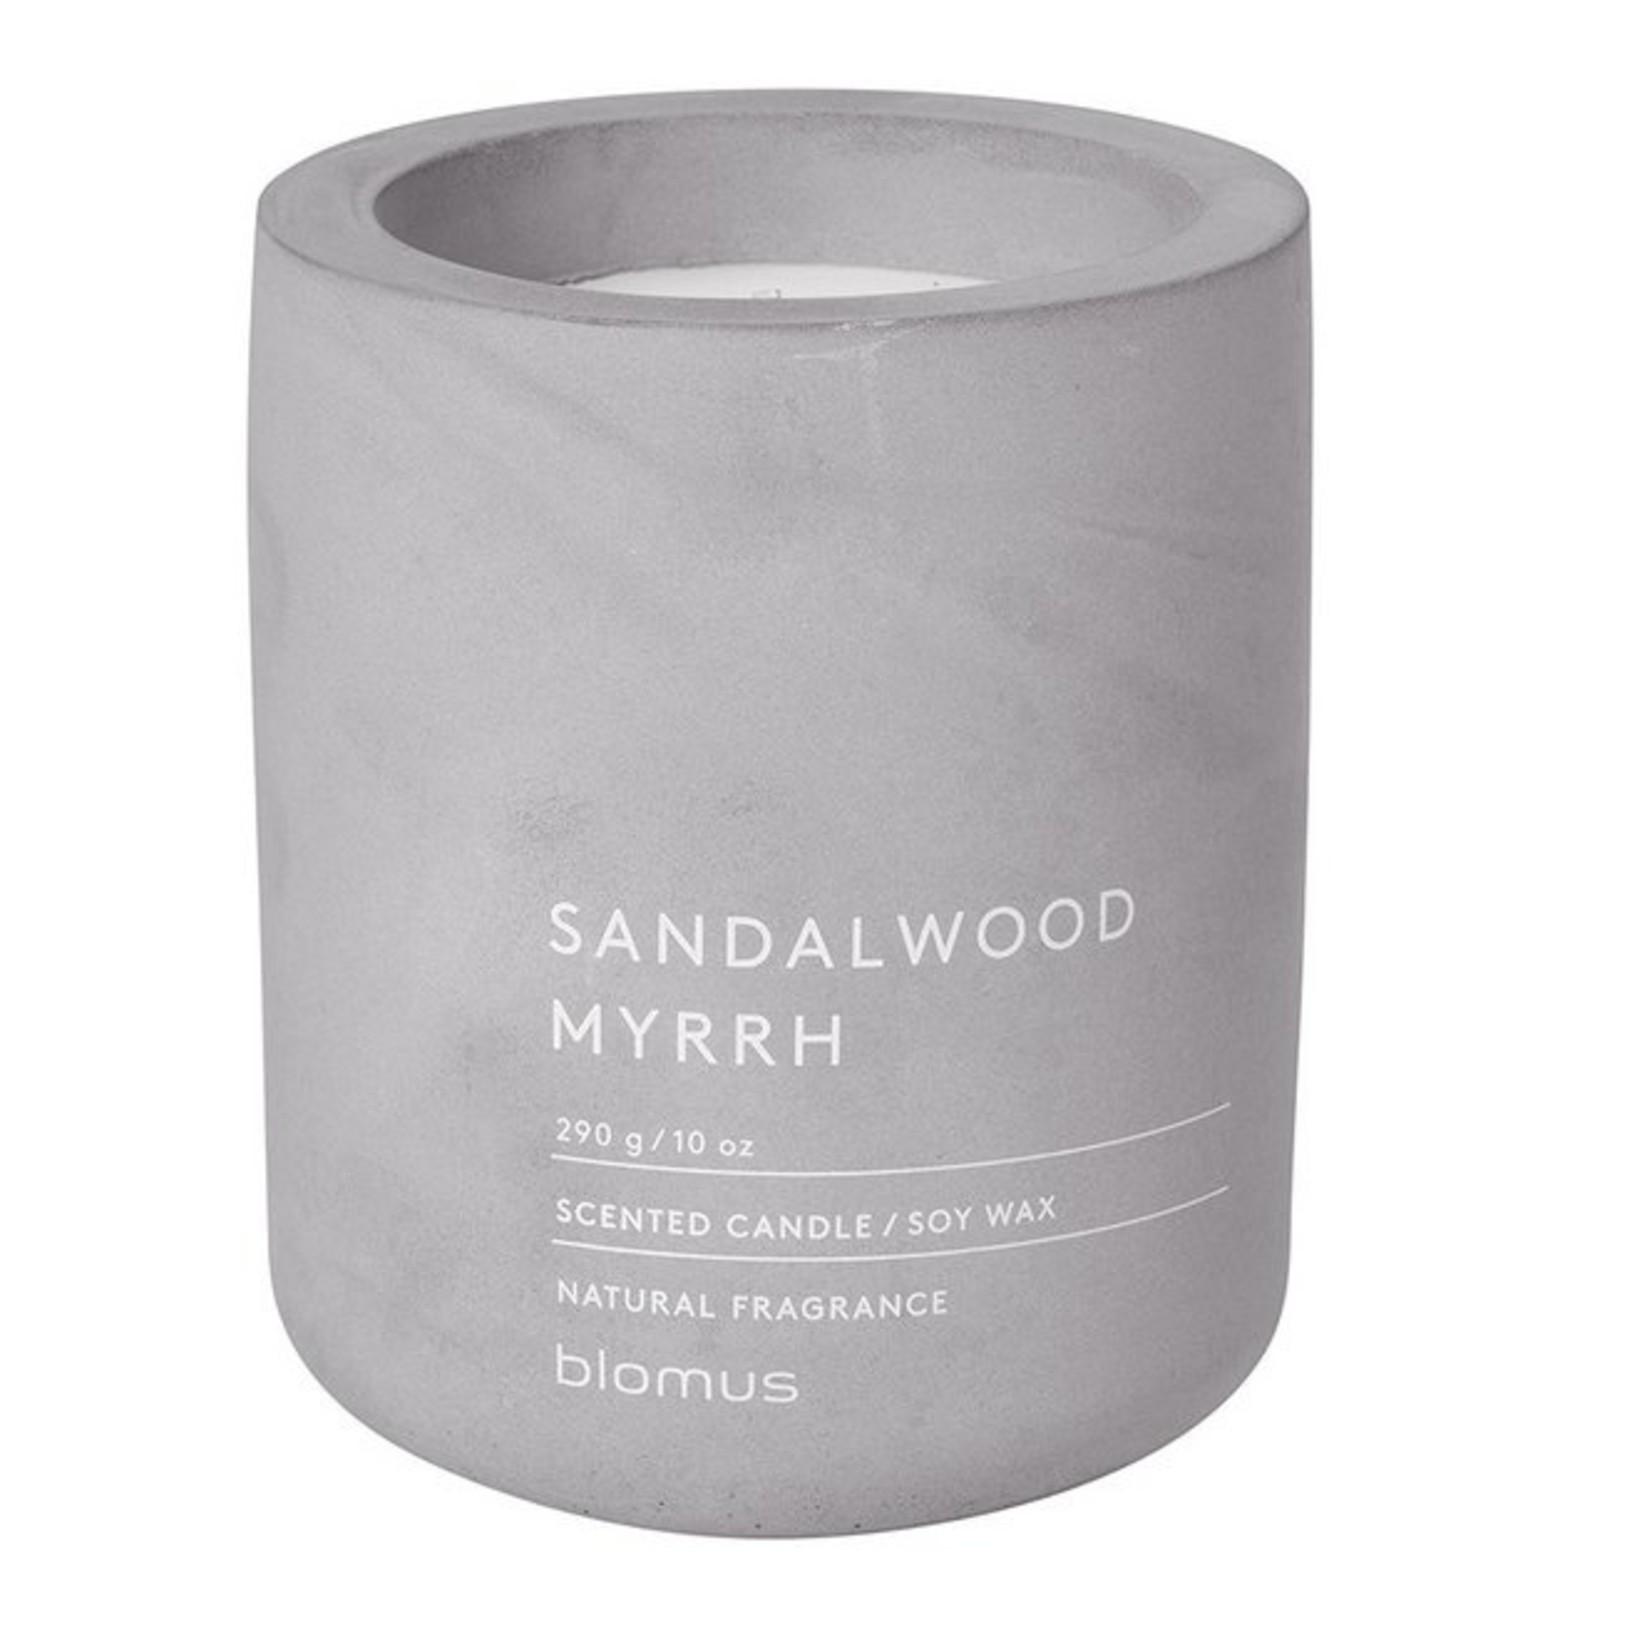 Blomus Geurkaars Large - Sandelwood myrrh - Micro chip